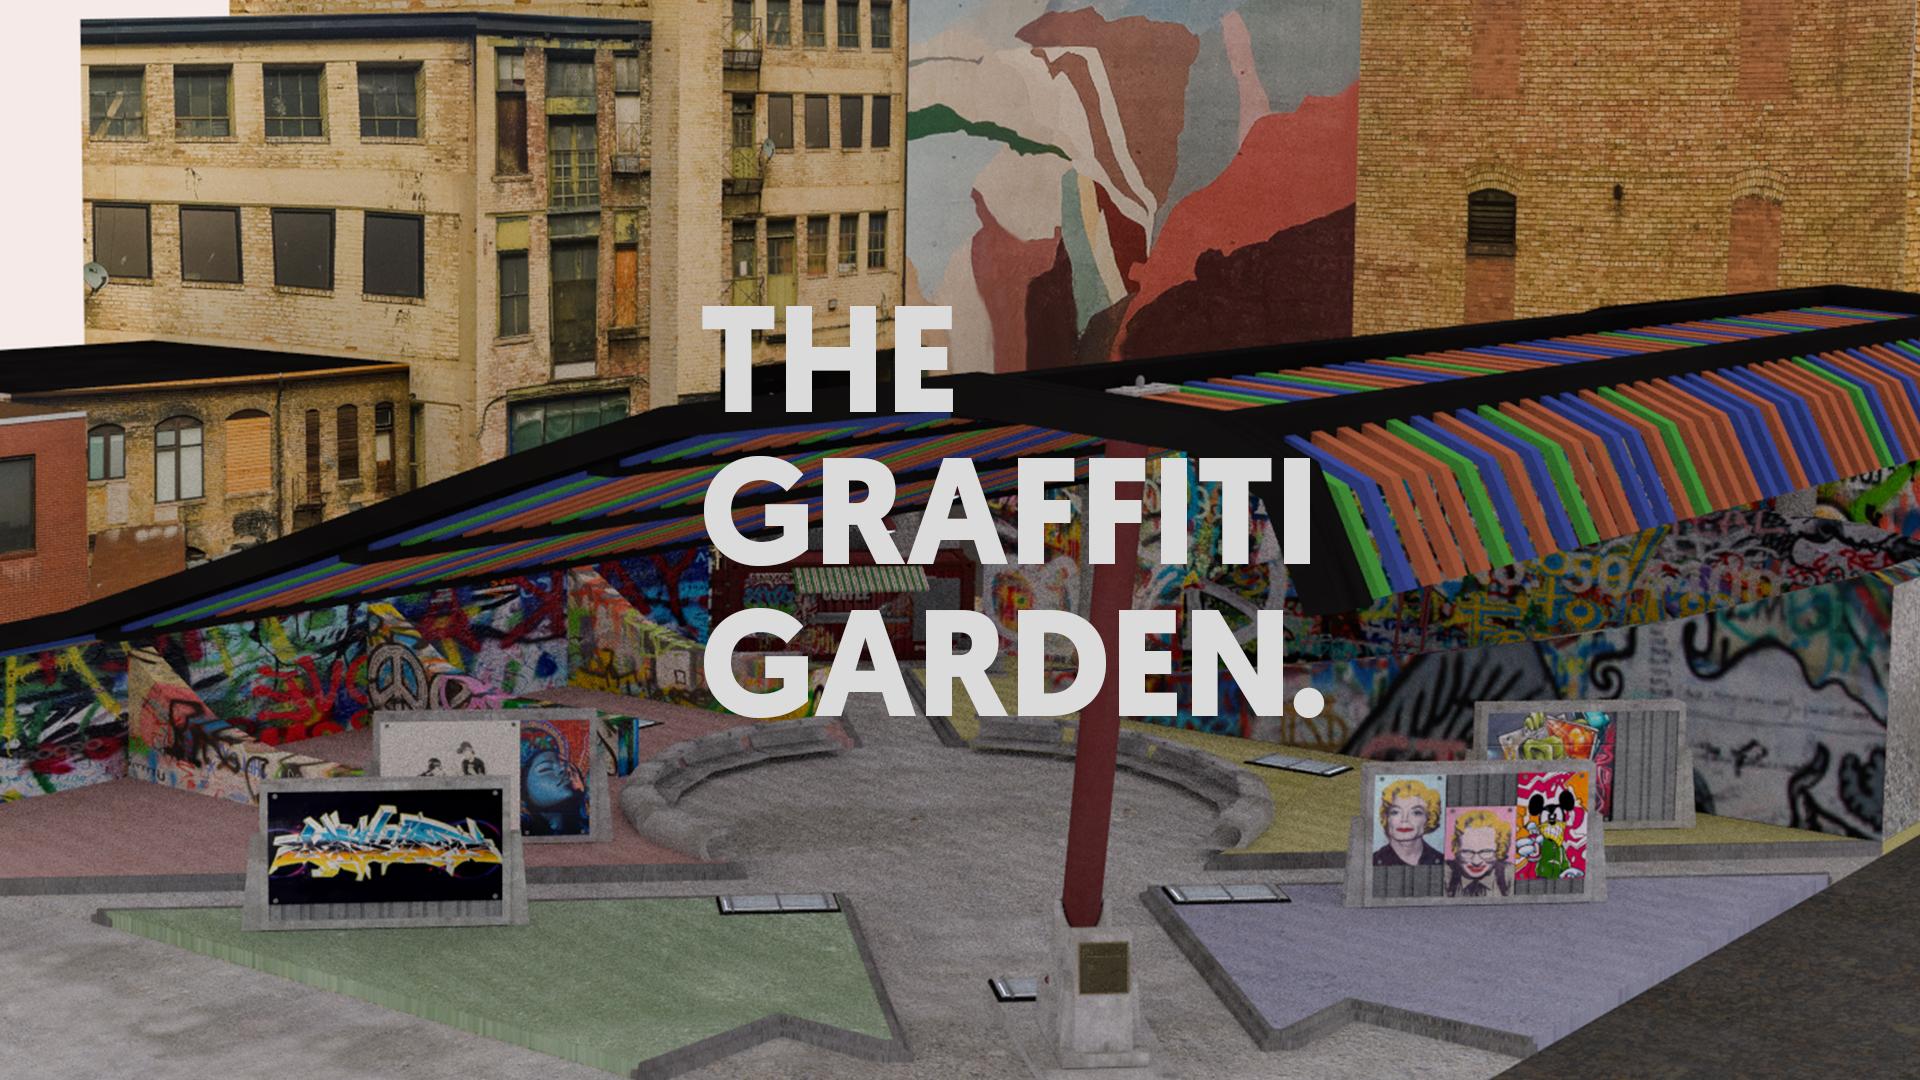 Case Study: The Graffiti Garden